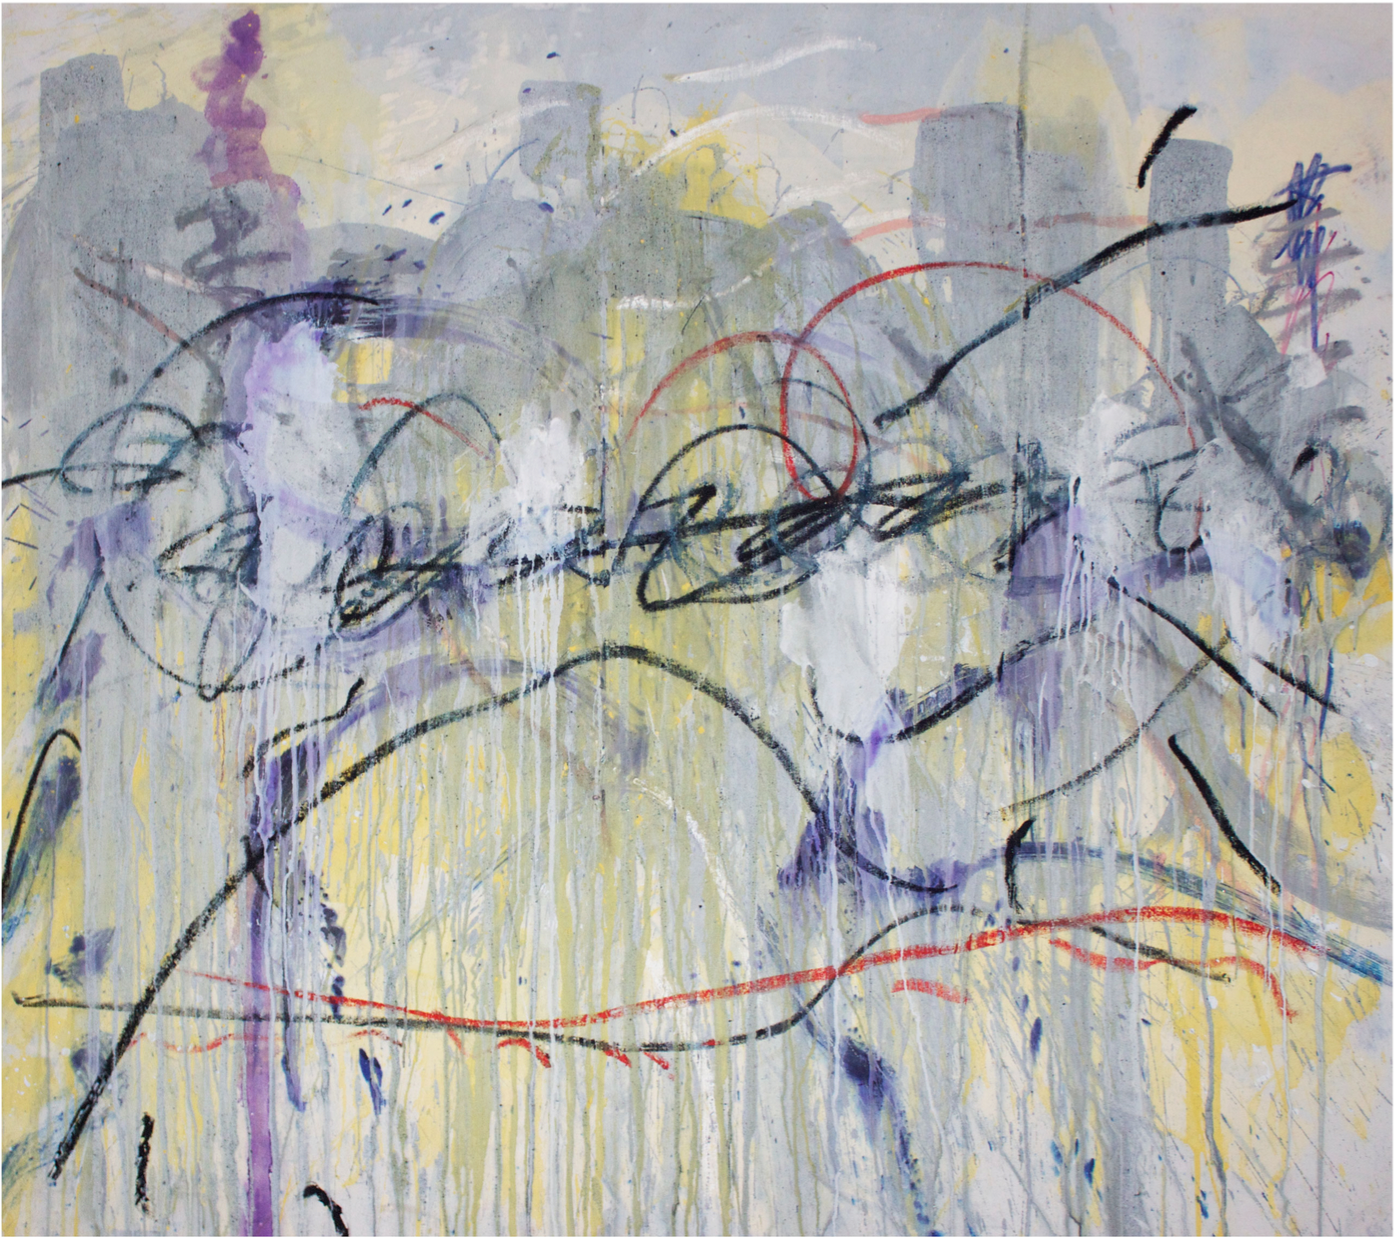 Oceanic Asphalt 4, Pigment, acrylic and oil stick on canvas, 180 x 200 cm, 2016